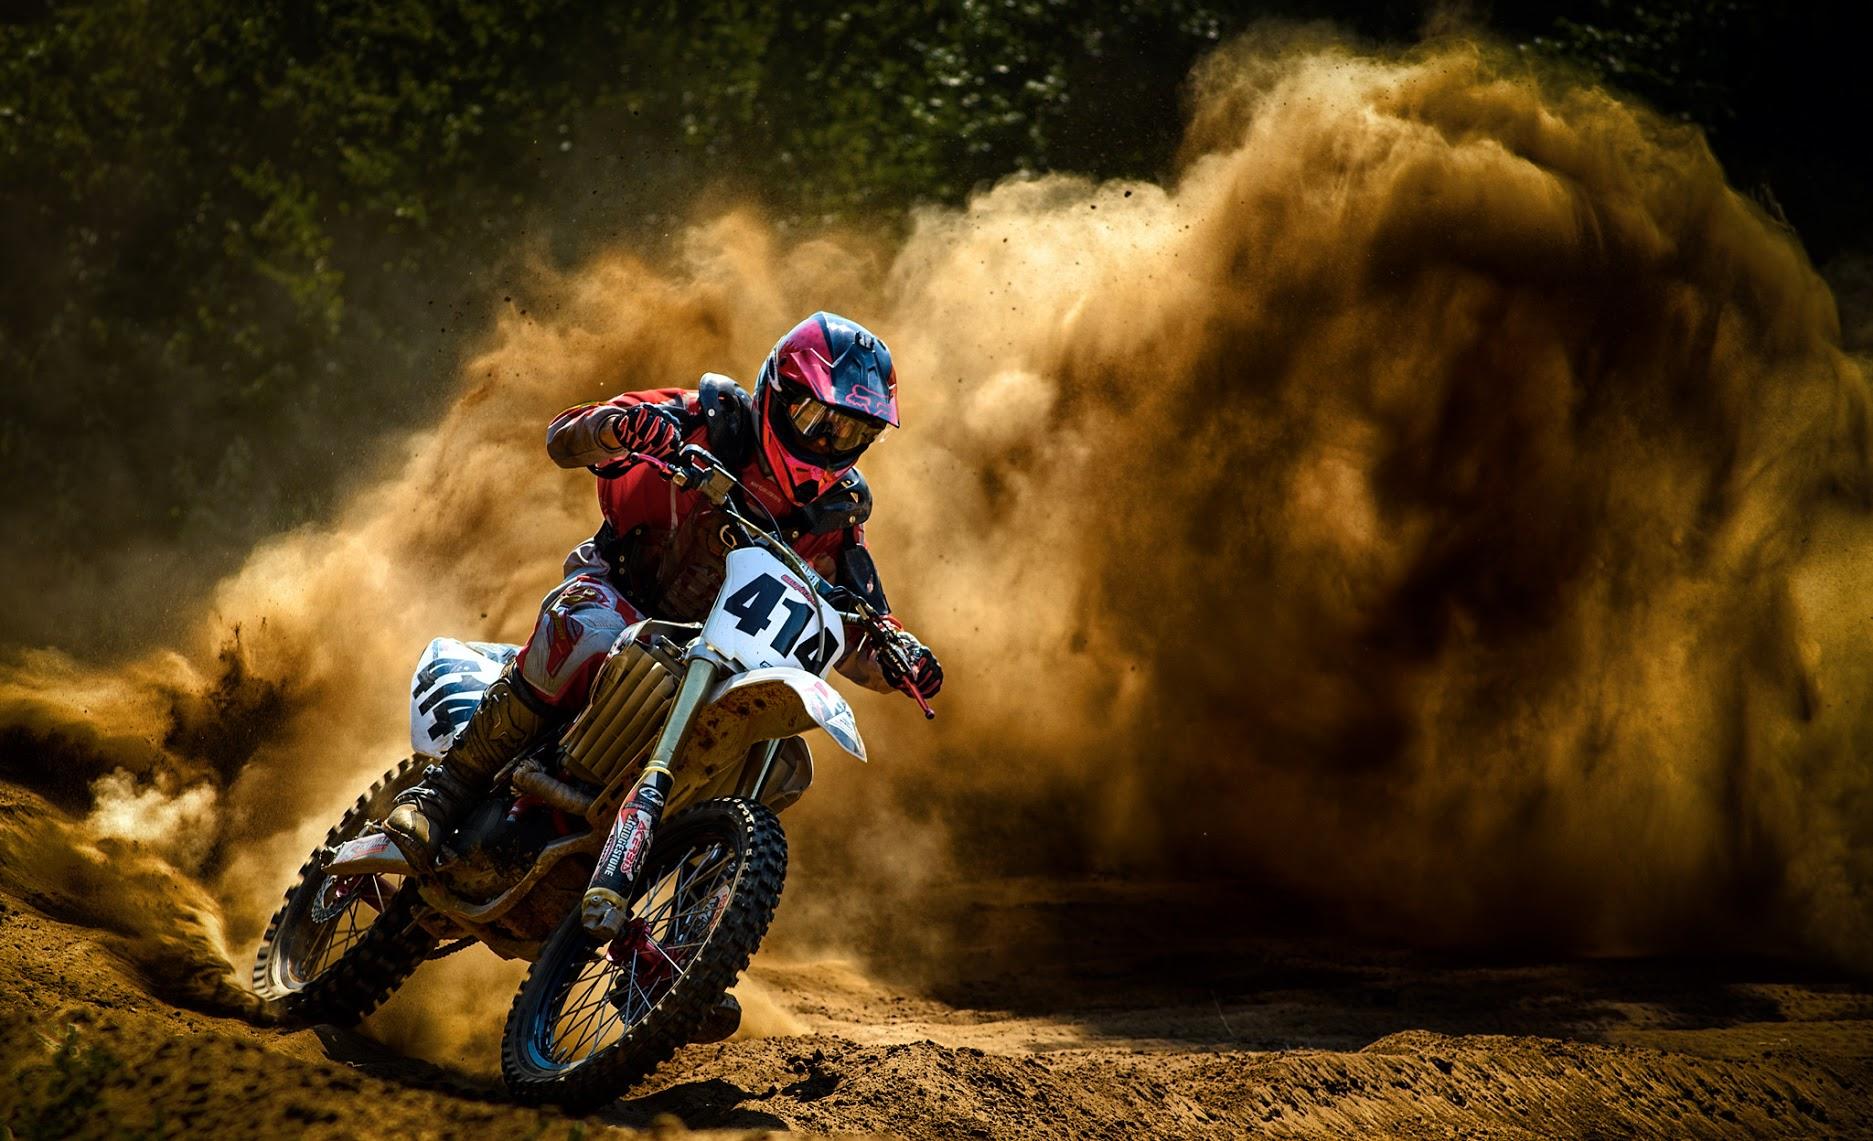 motocross dirt